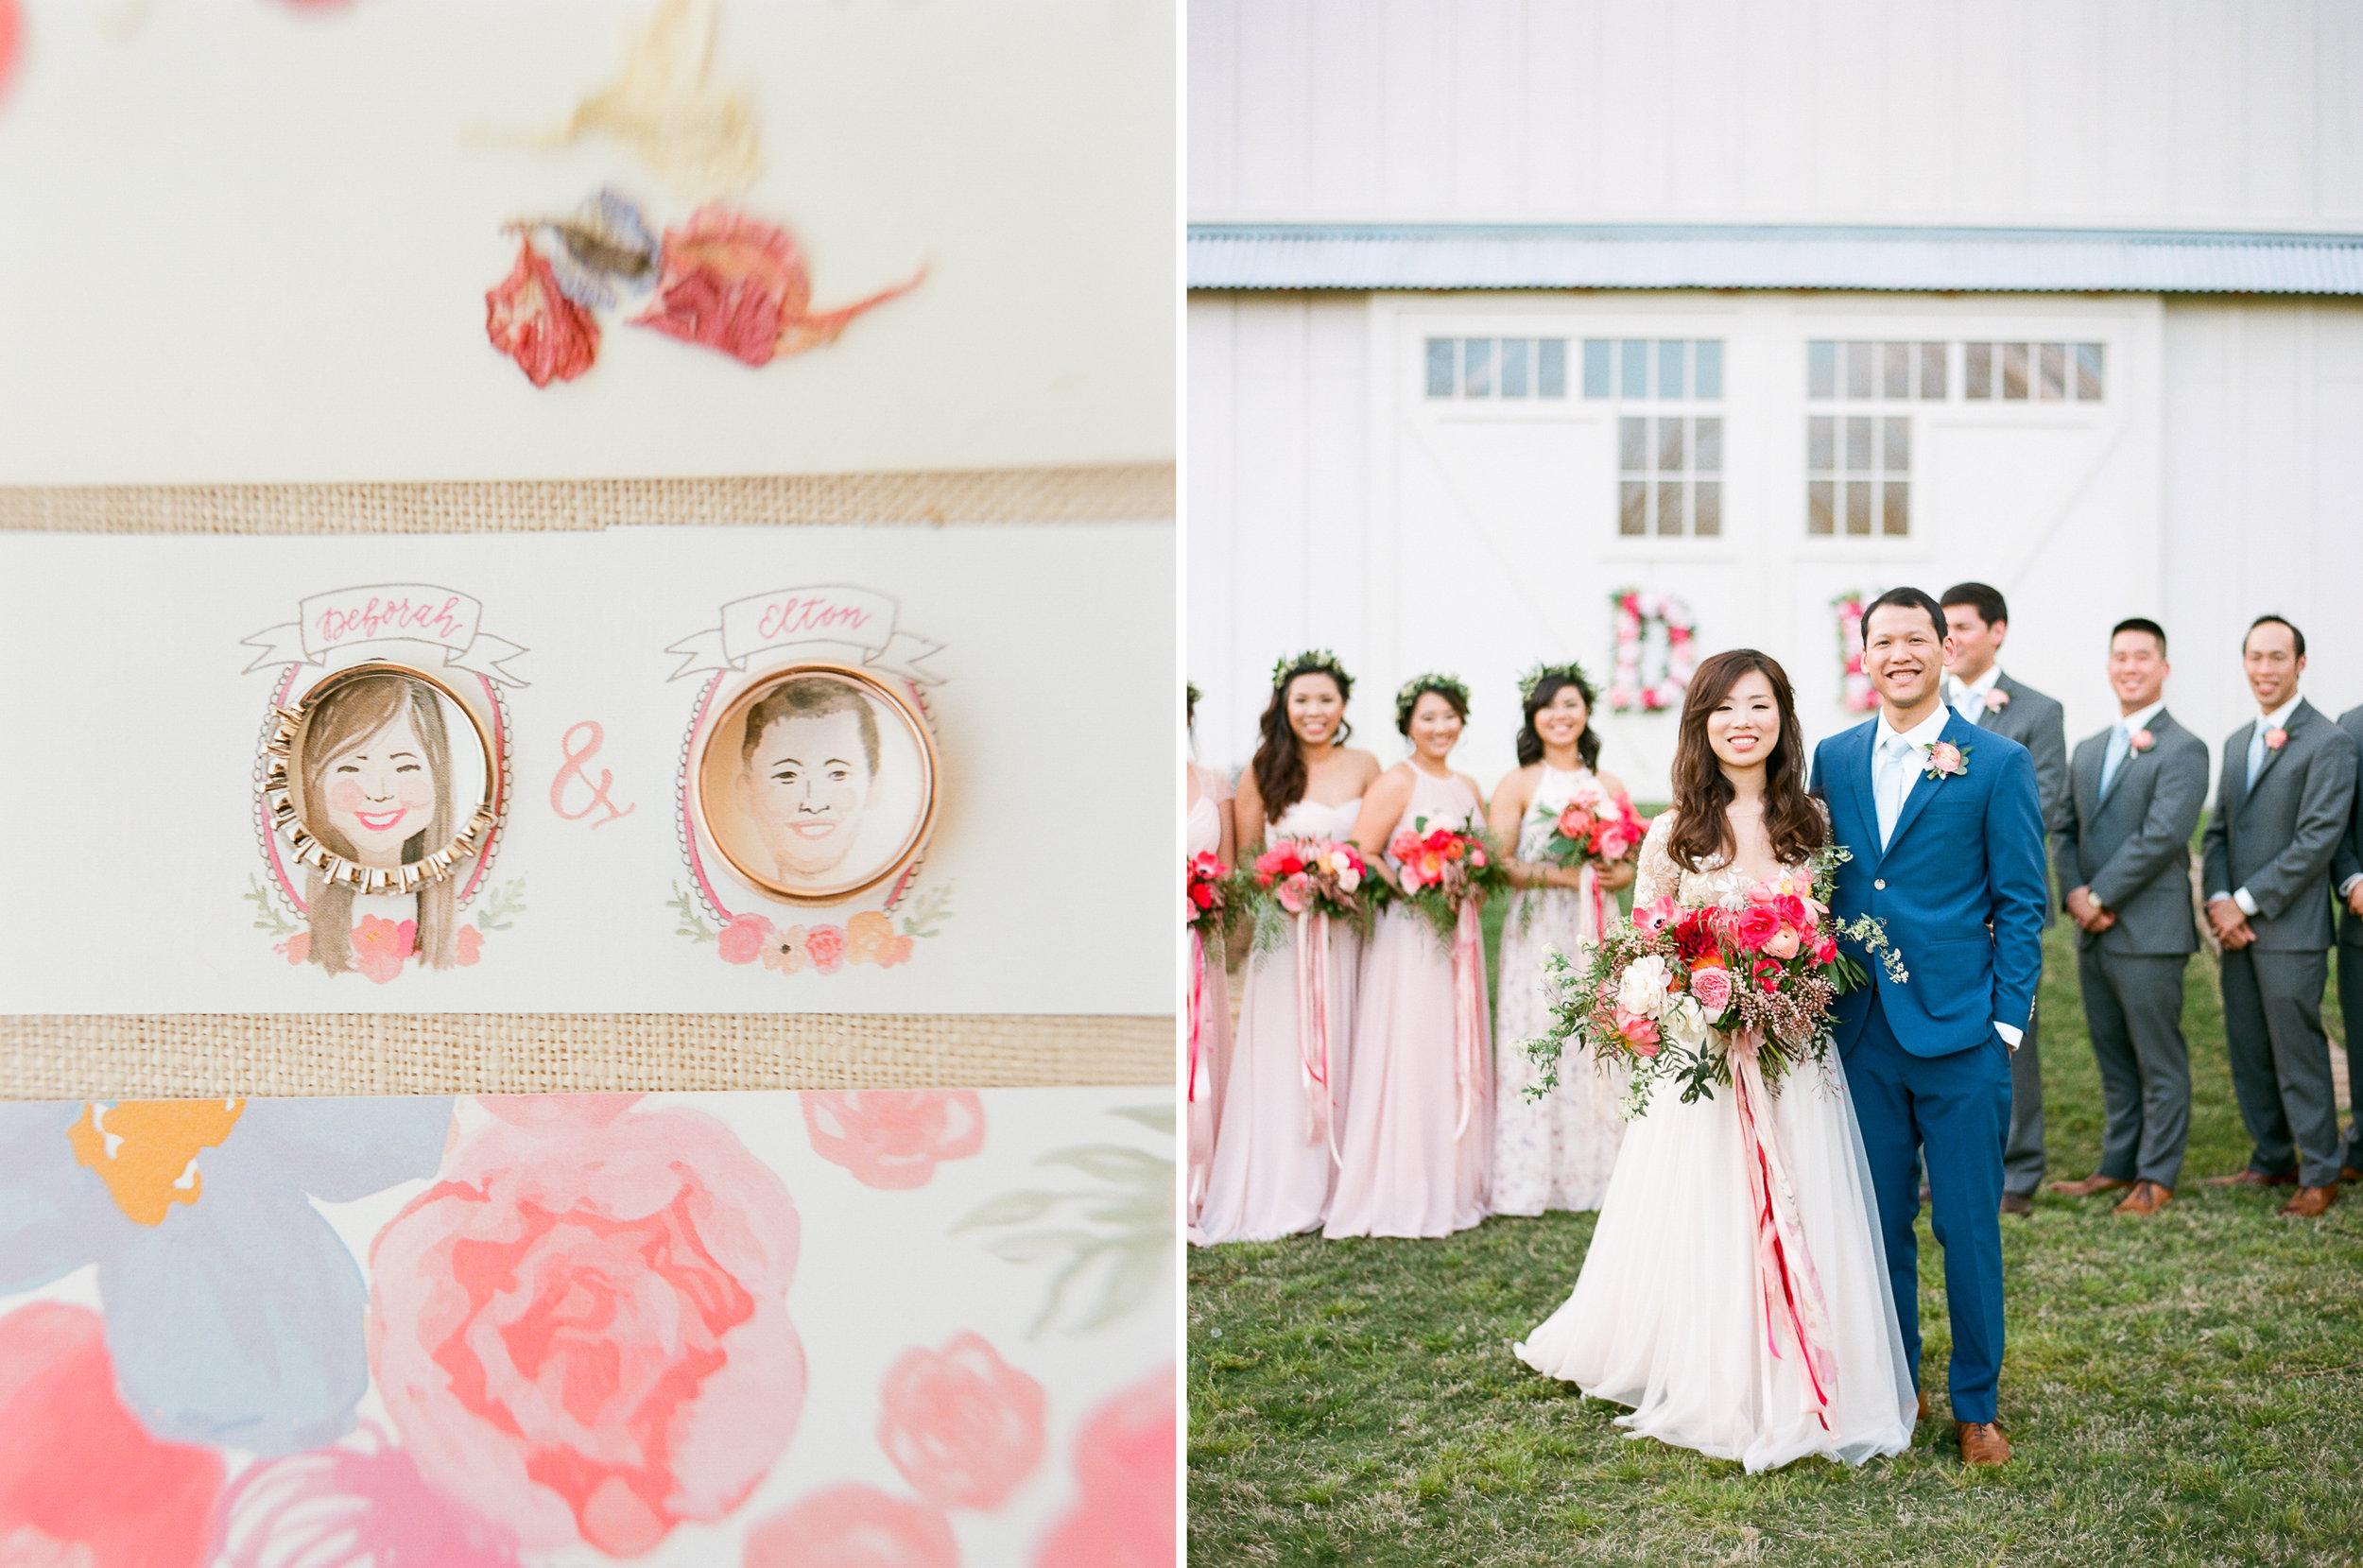 The-Knot-50-Weddings-50-States-Texas-Winner-Dana-Fernandez-photography-houston-wedding-photographer-film-fine-art-destination-134.jpg